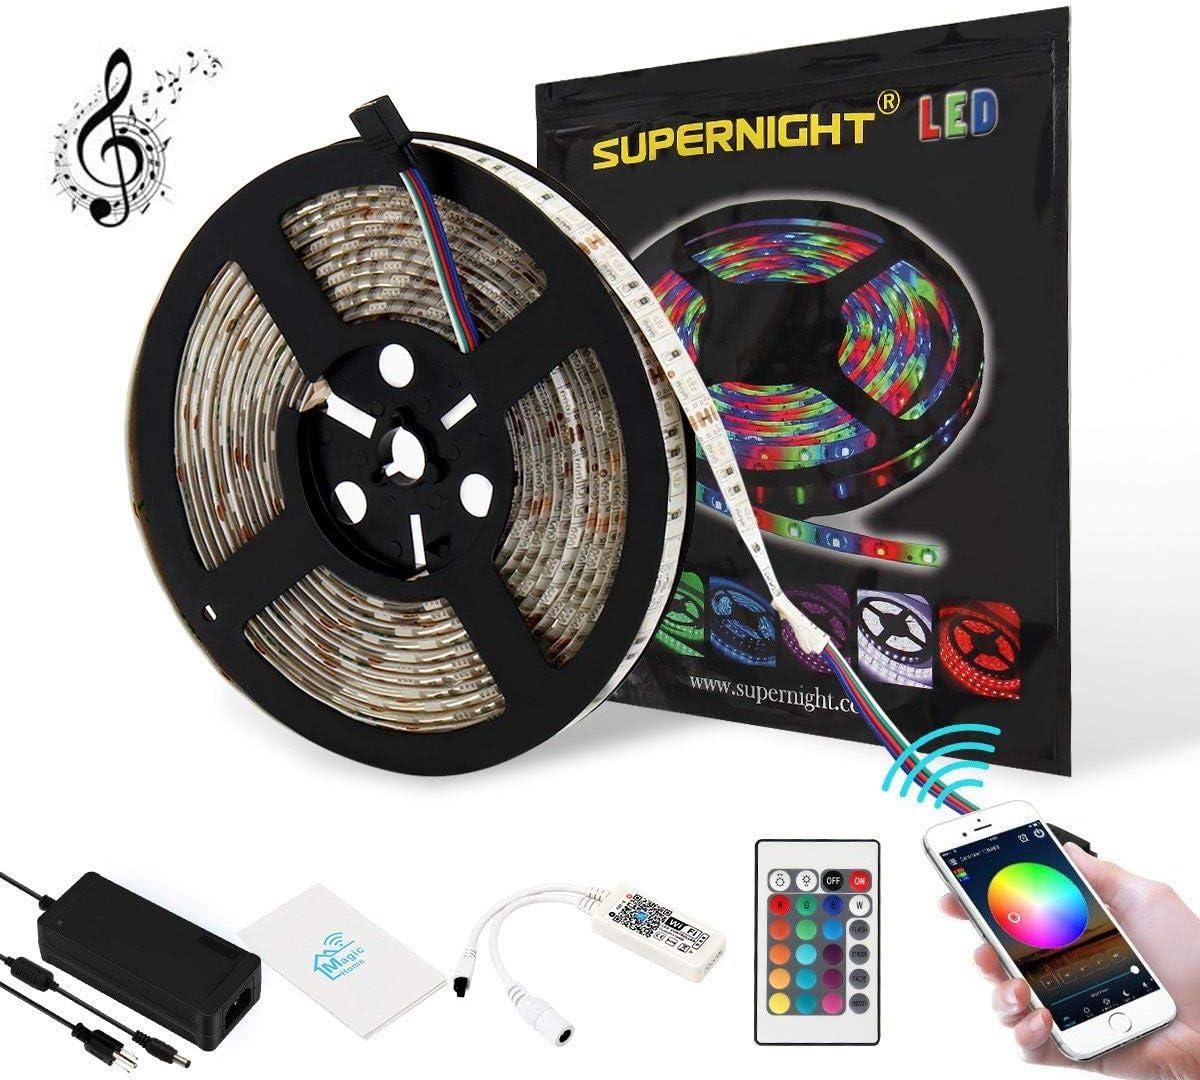 SUPERNIGHT 5050 RGB LED Light Strip Kit Philadelphia Mall Con WiFi with Waterproof Ranking TOP8